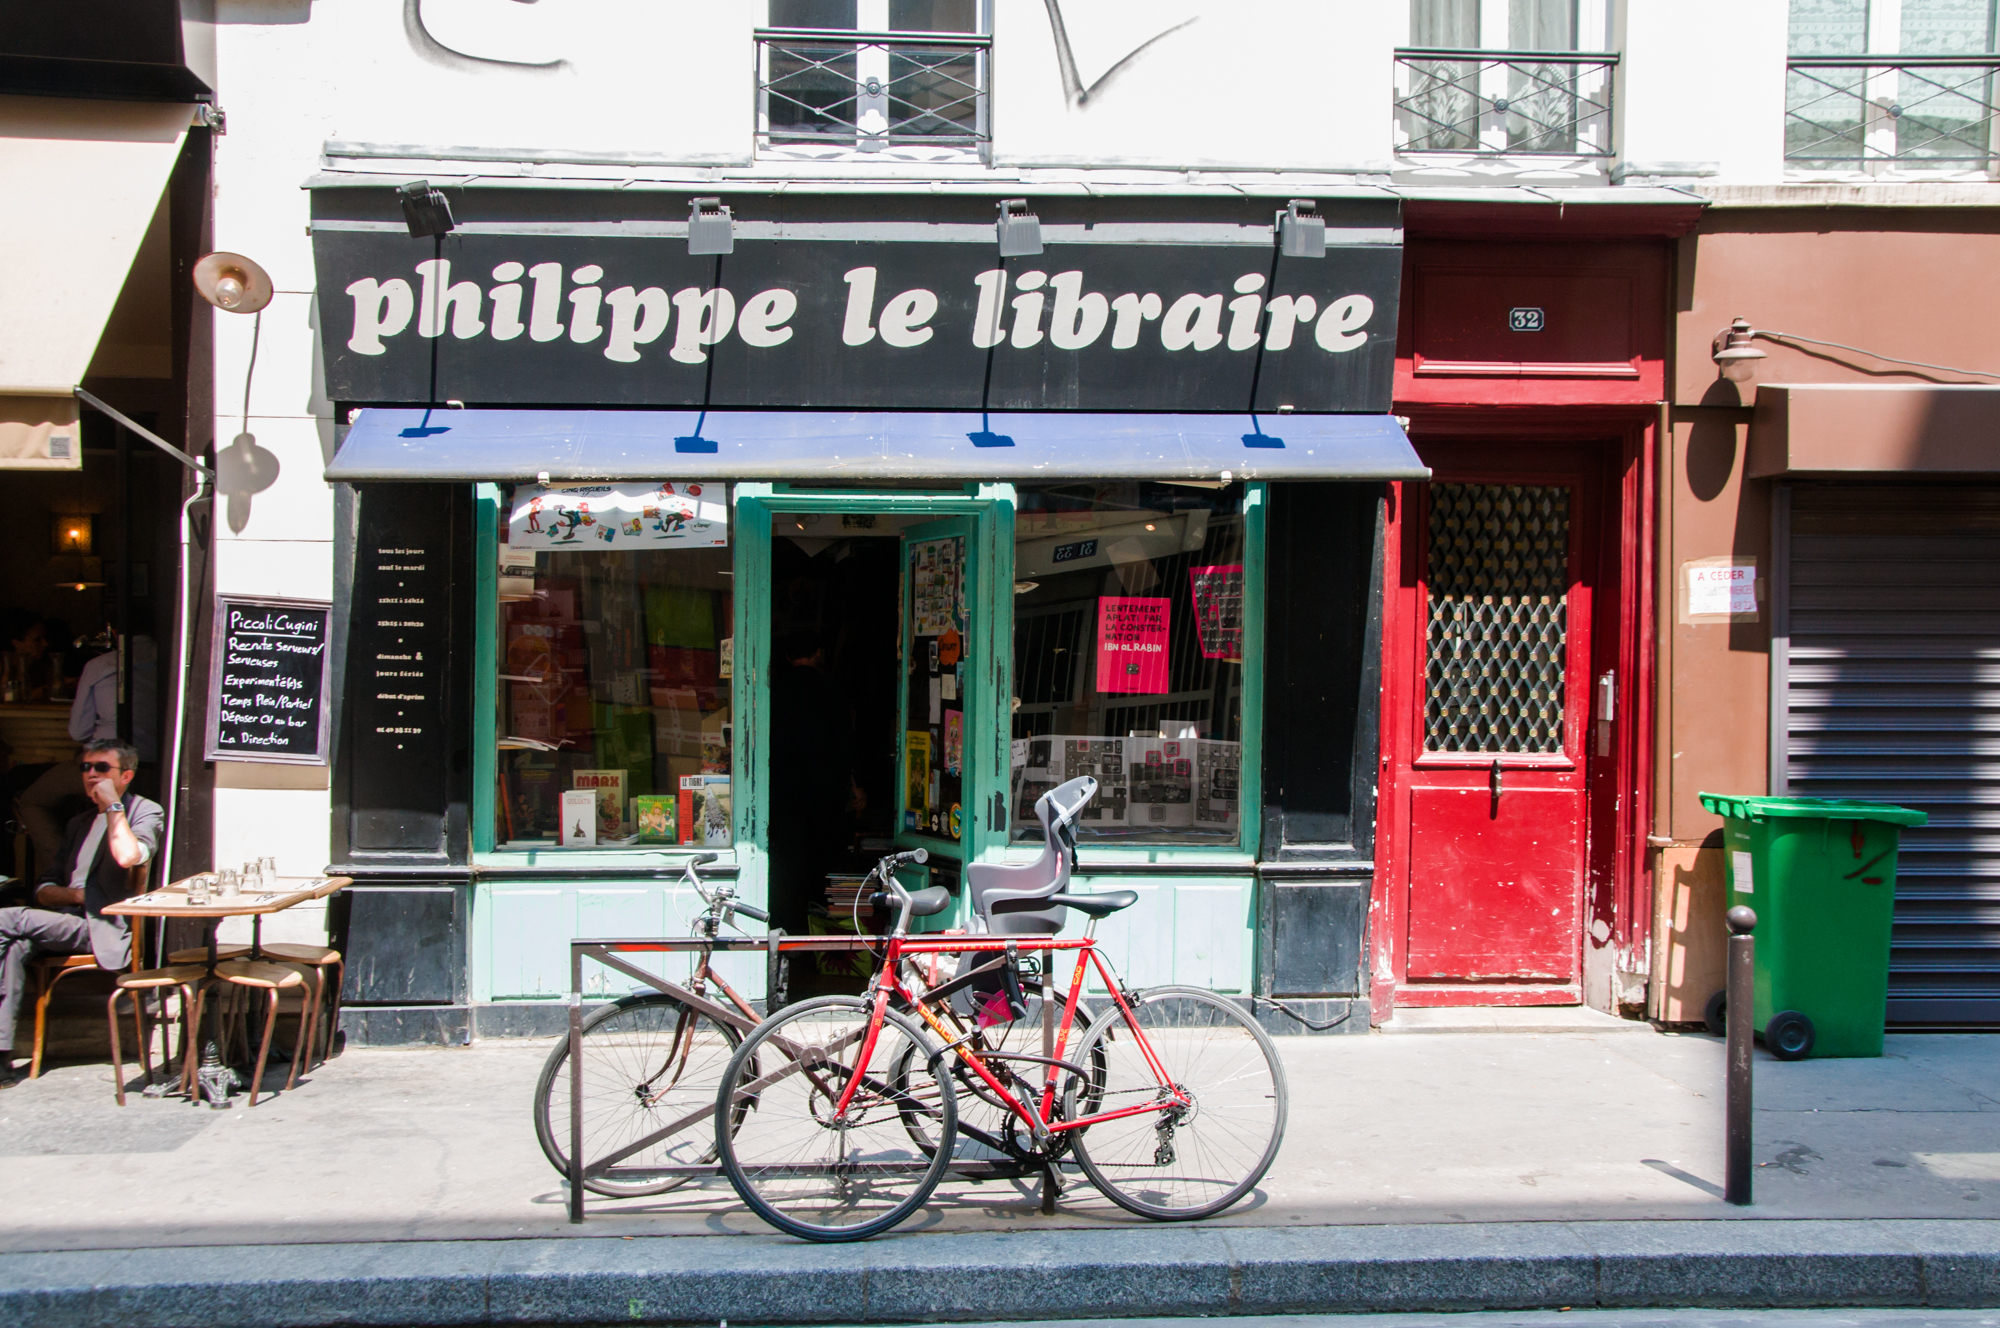 Philippe le Libraire